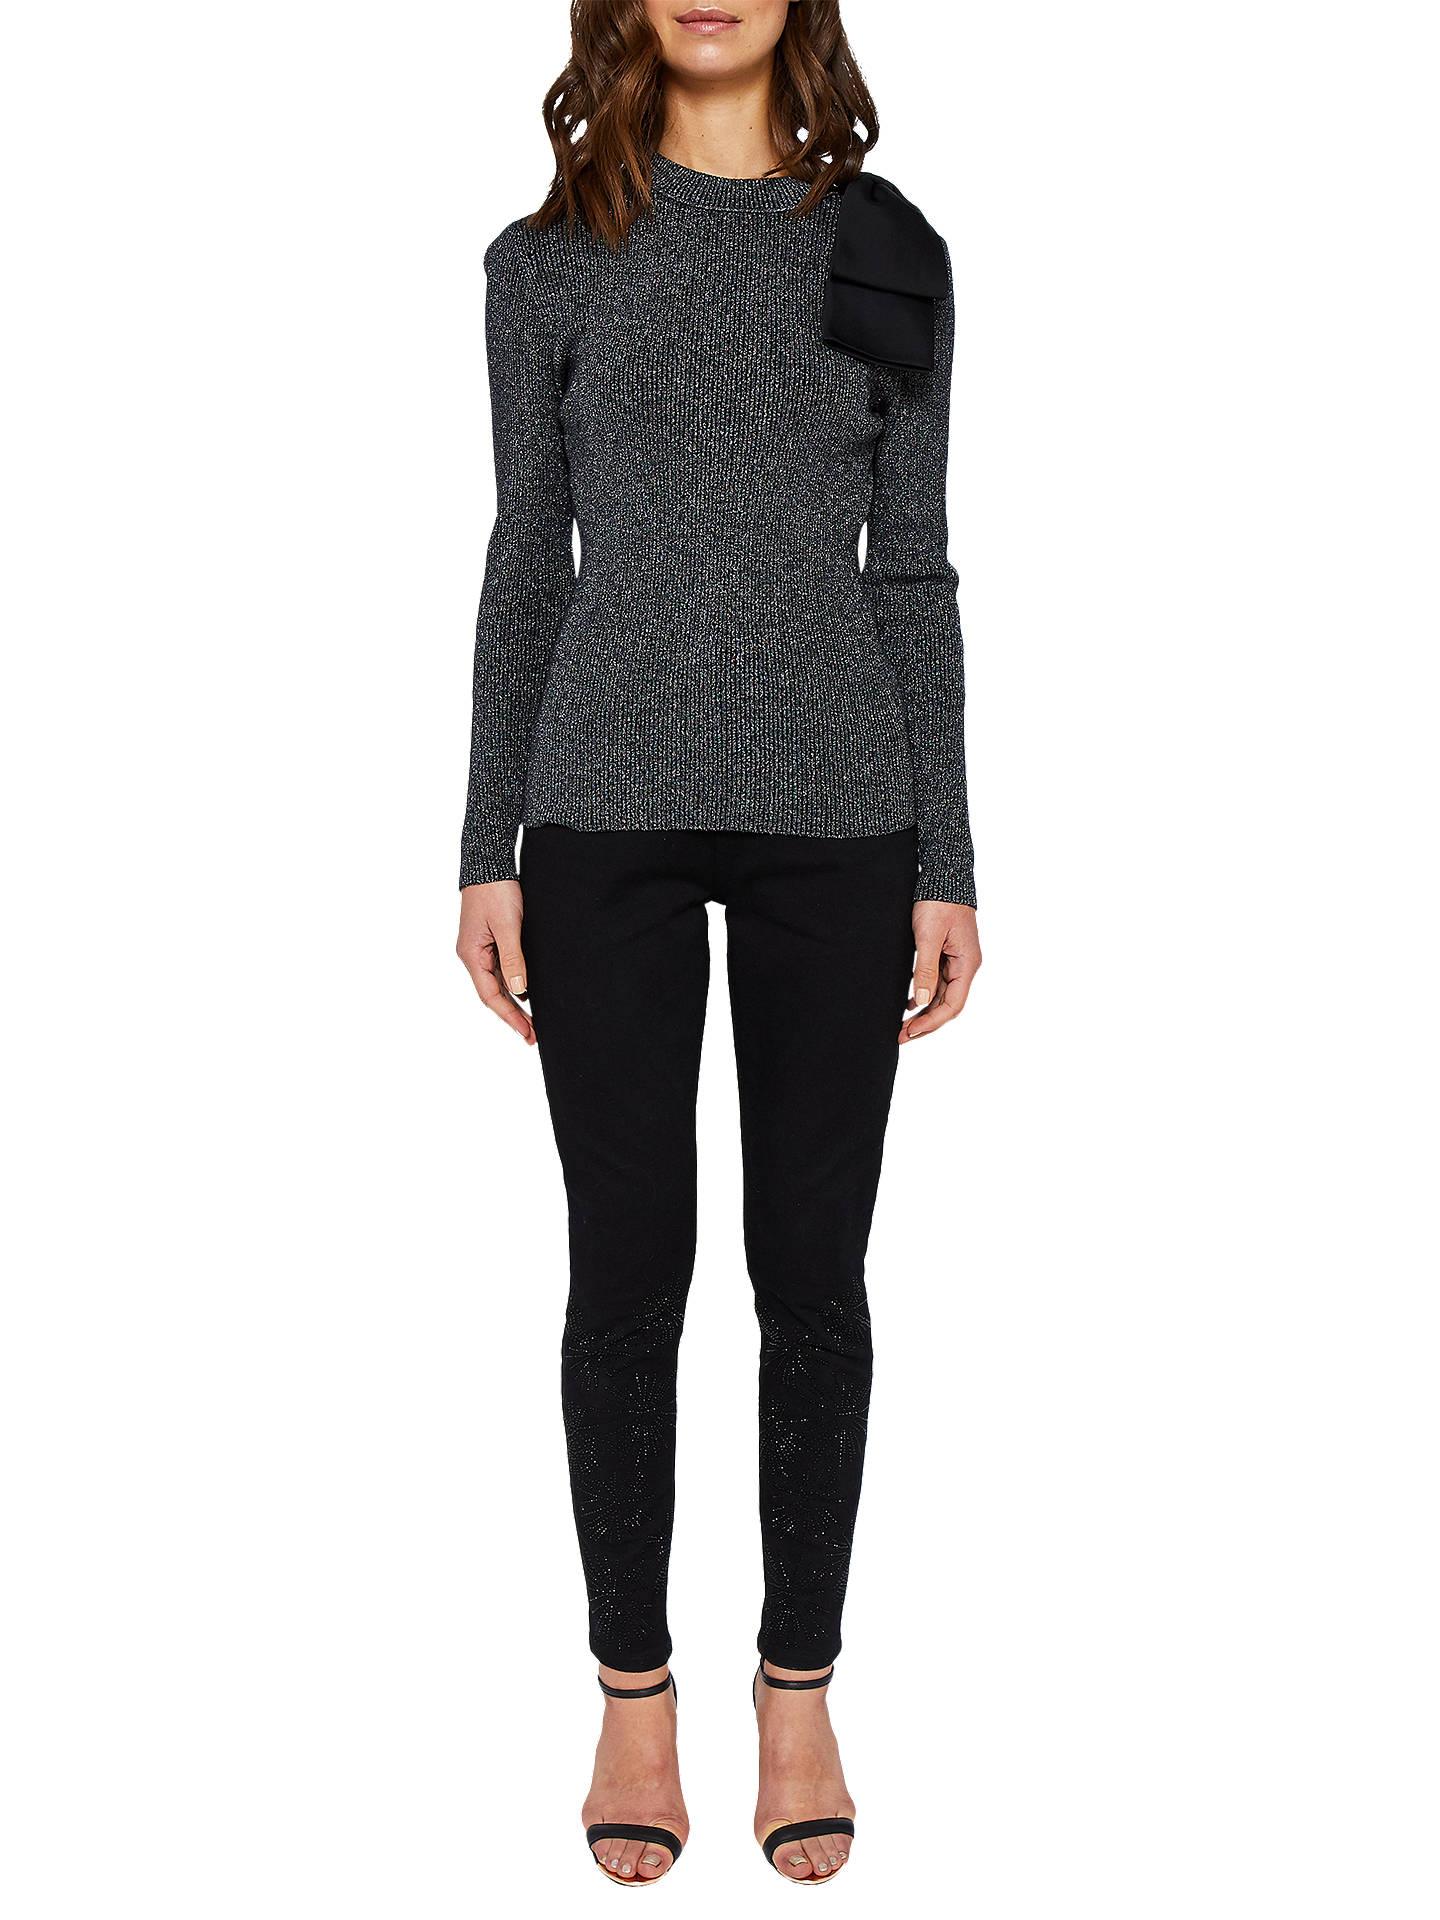 1808866f8b9 Buy Ted Baker Raelynn Stardust Embellished Skinny Jeans